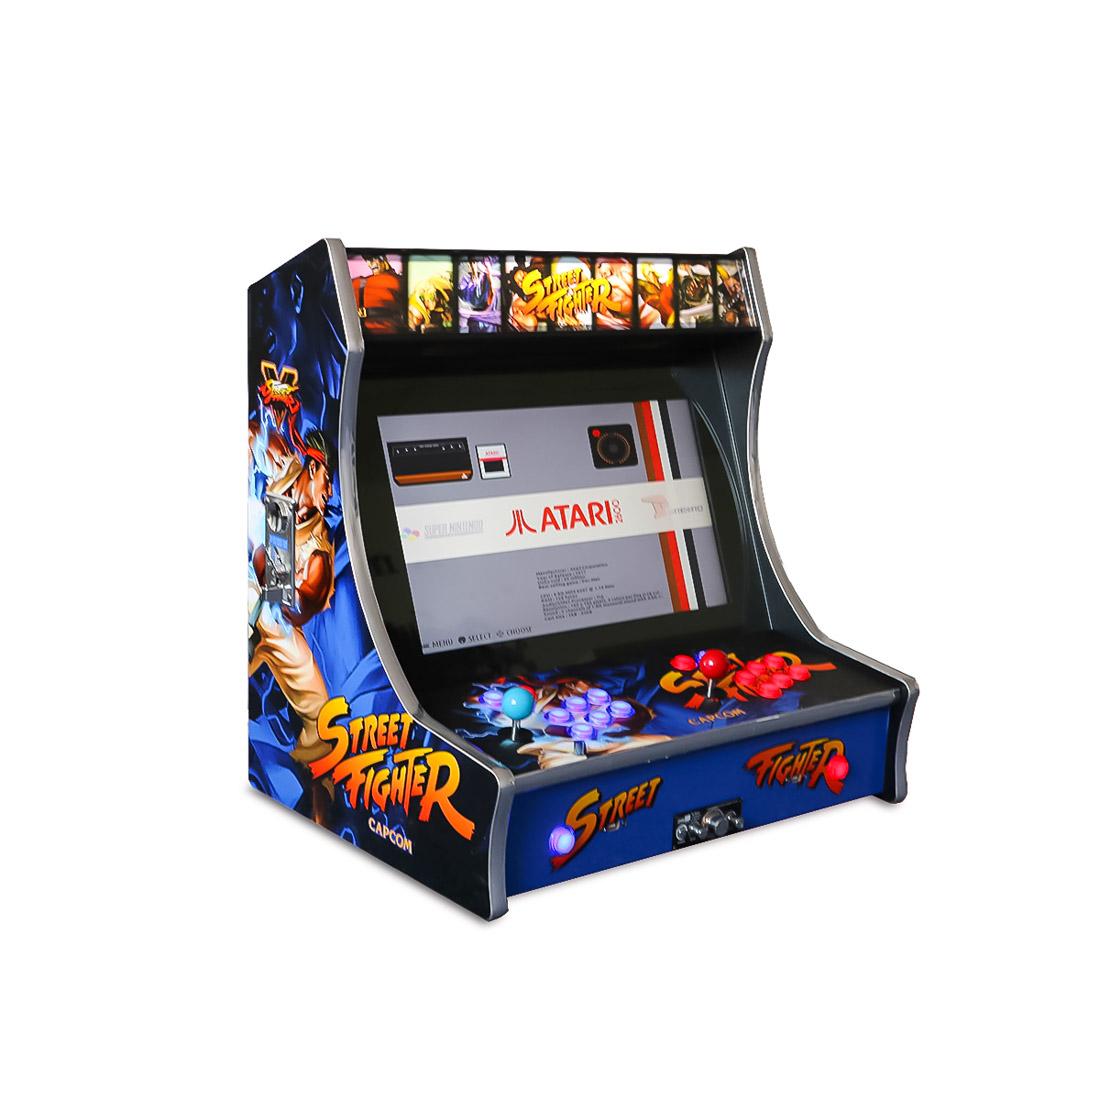 21.5″ Street Fighter Bartop Arcade